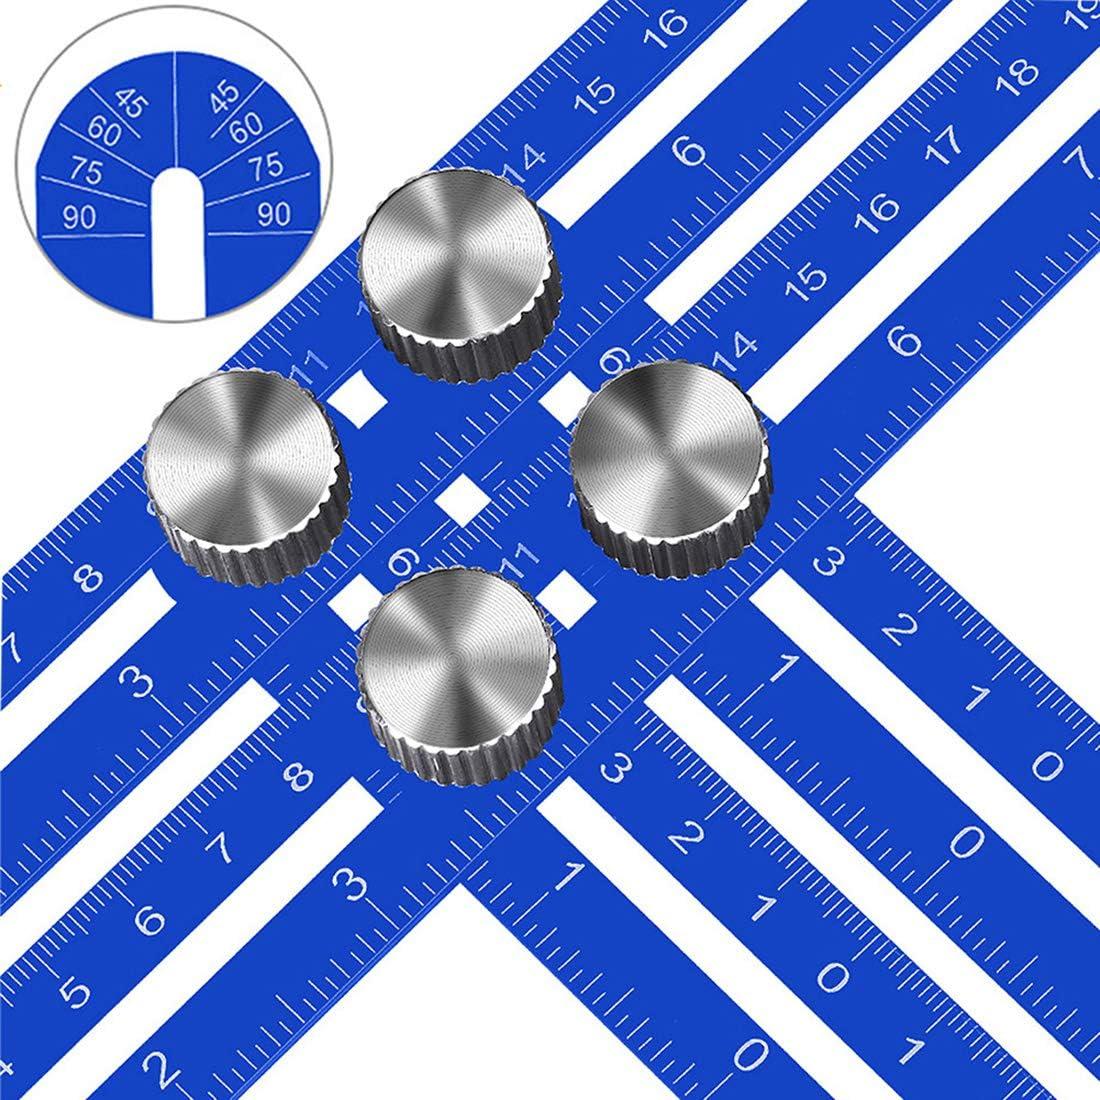 KEGOUU Multi Angle Measuring Ruler, Premium Aluminum Alloy Ultimate Marking Template Tool/Woodworking Tool for Craftsmen Builders DIY-ers (4 sides, Blue)